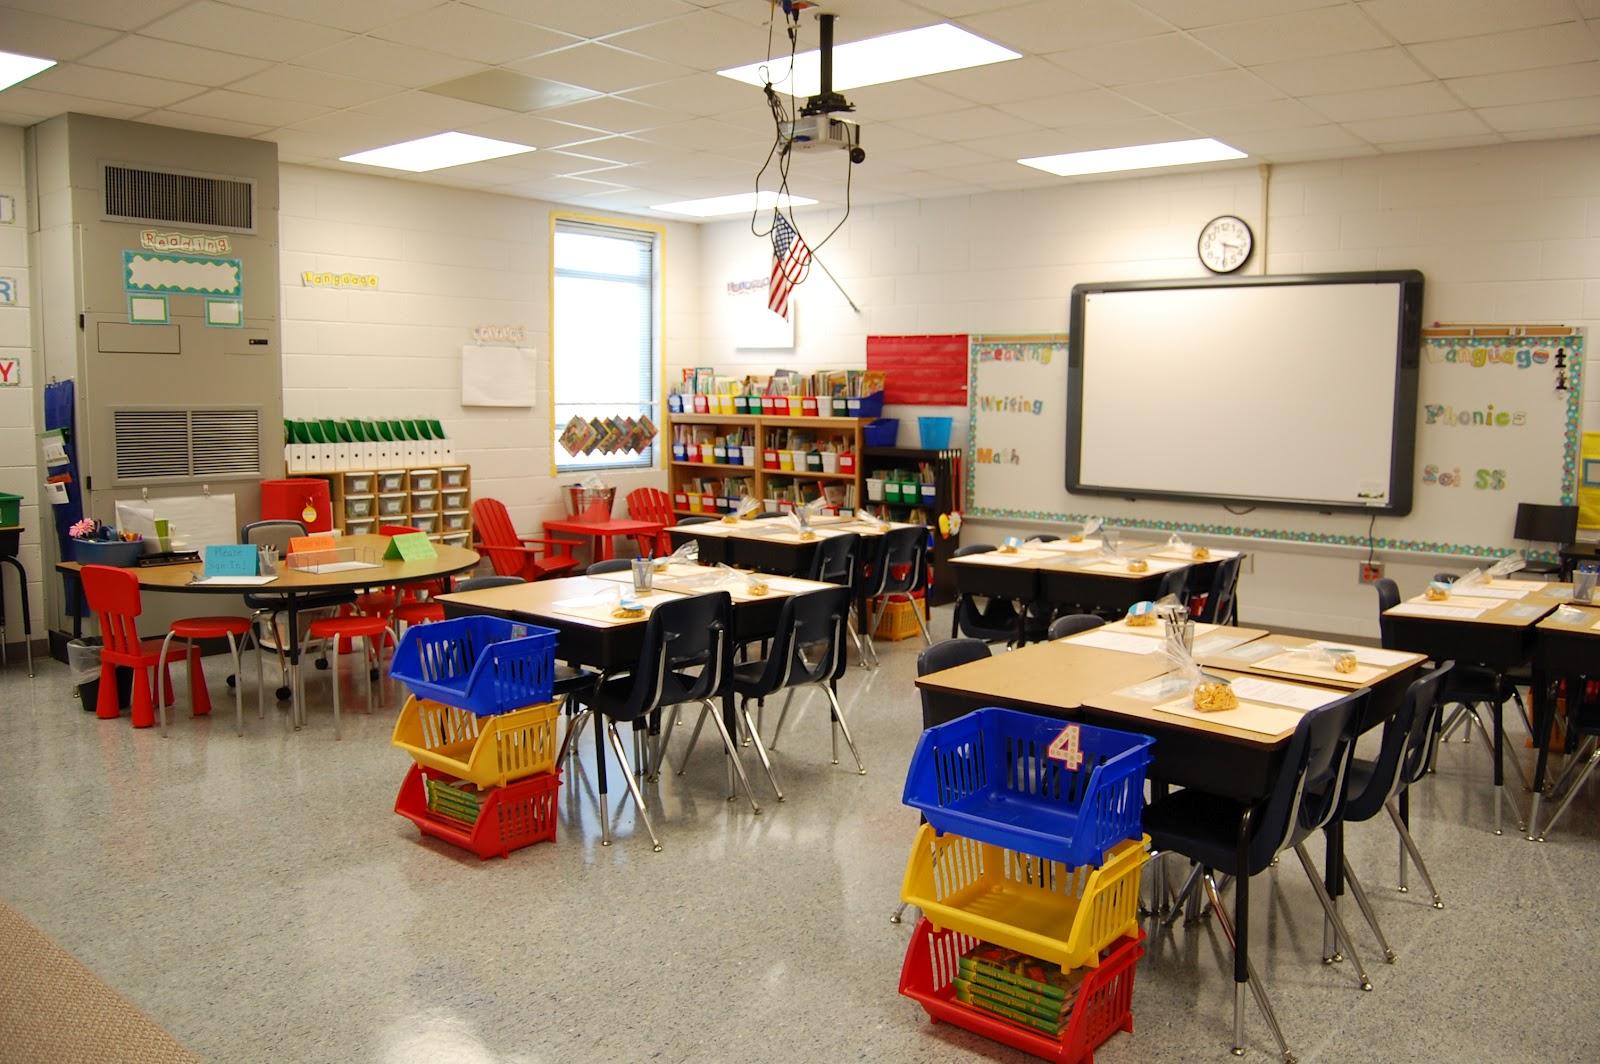 how to use promethean board in classroom